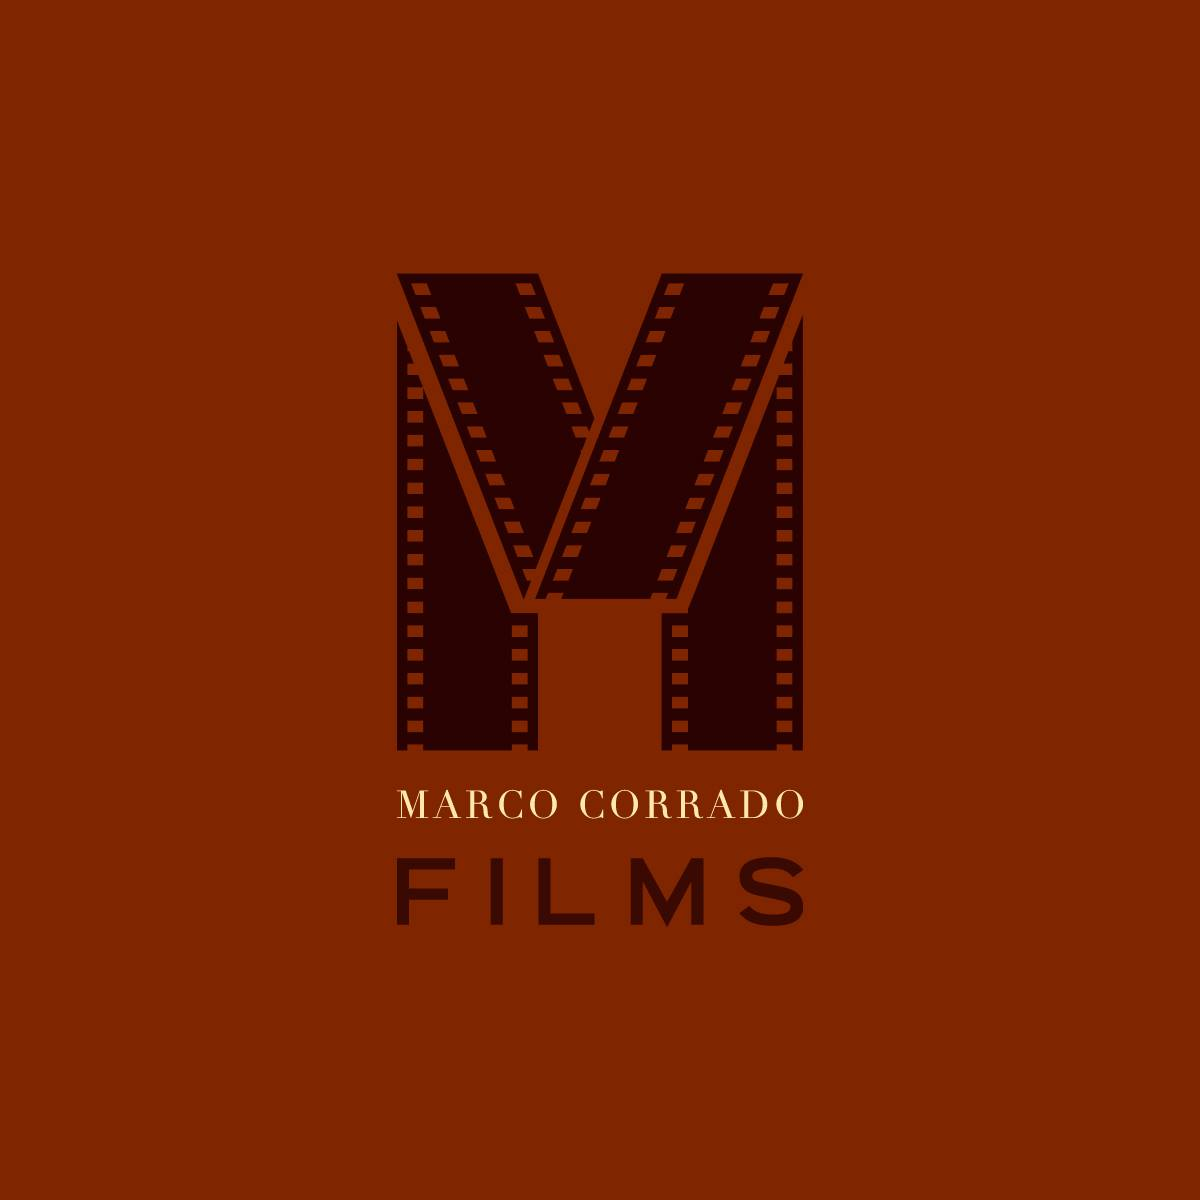 Marco Corrado Films_Red.jpg